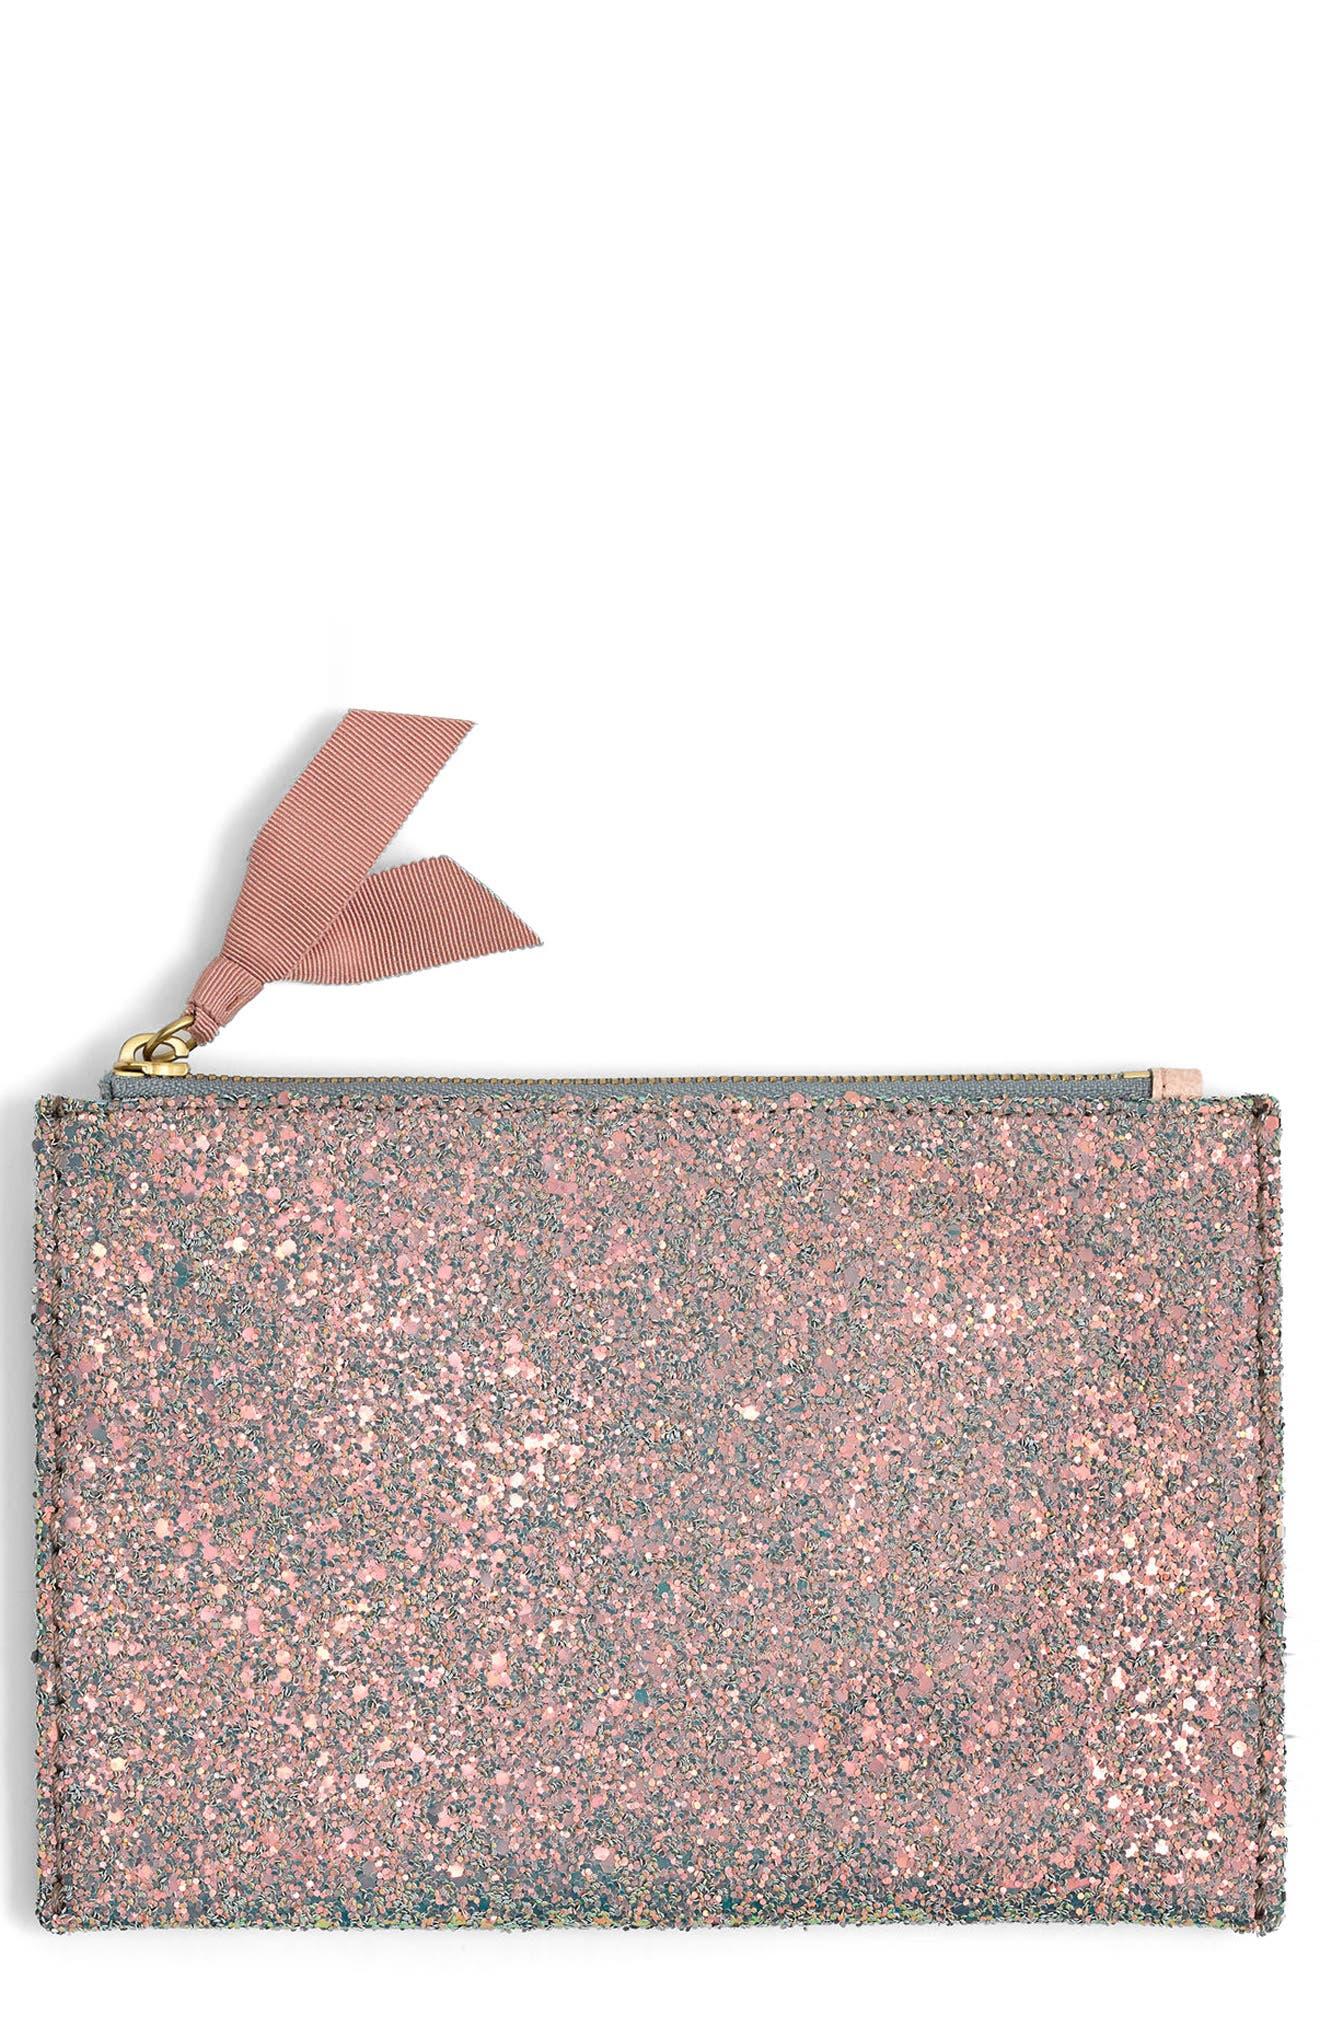 Medium Glitter Pouch,                             Main thumbnail 1, color,                             900